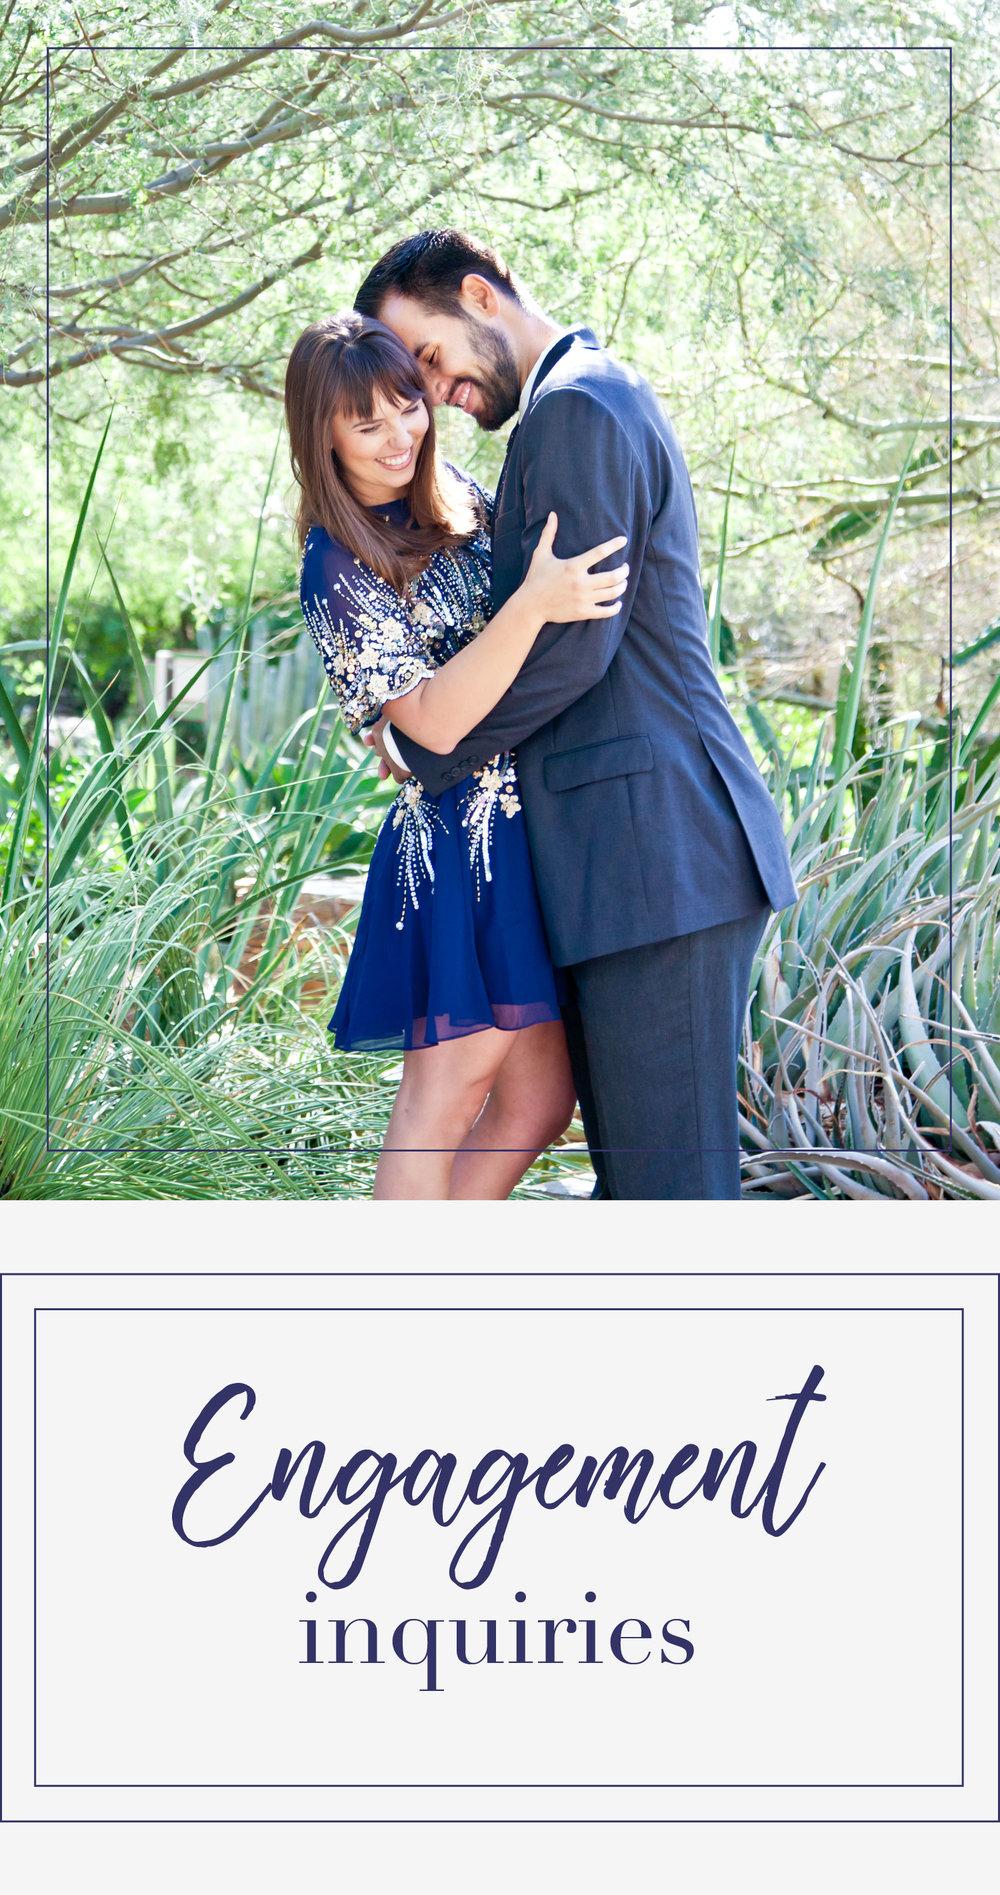 Teresa-Valencia-Photography-Engagement-Contact.jpg